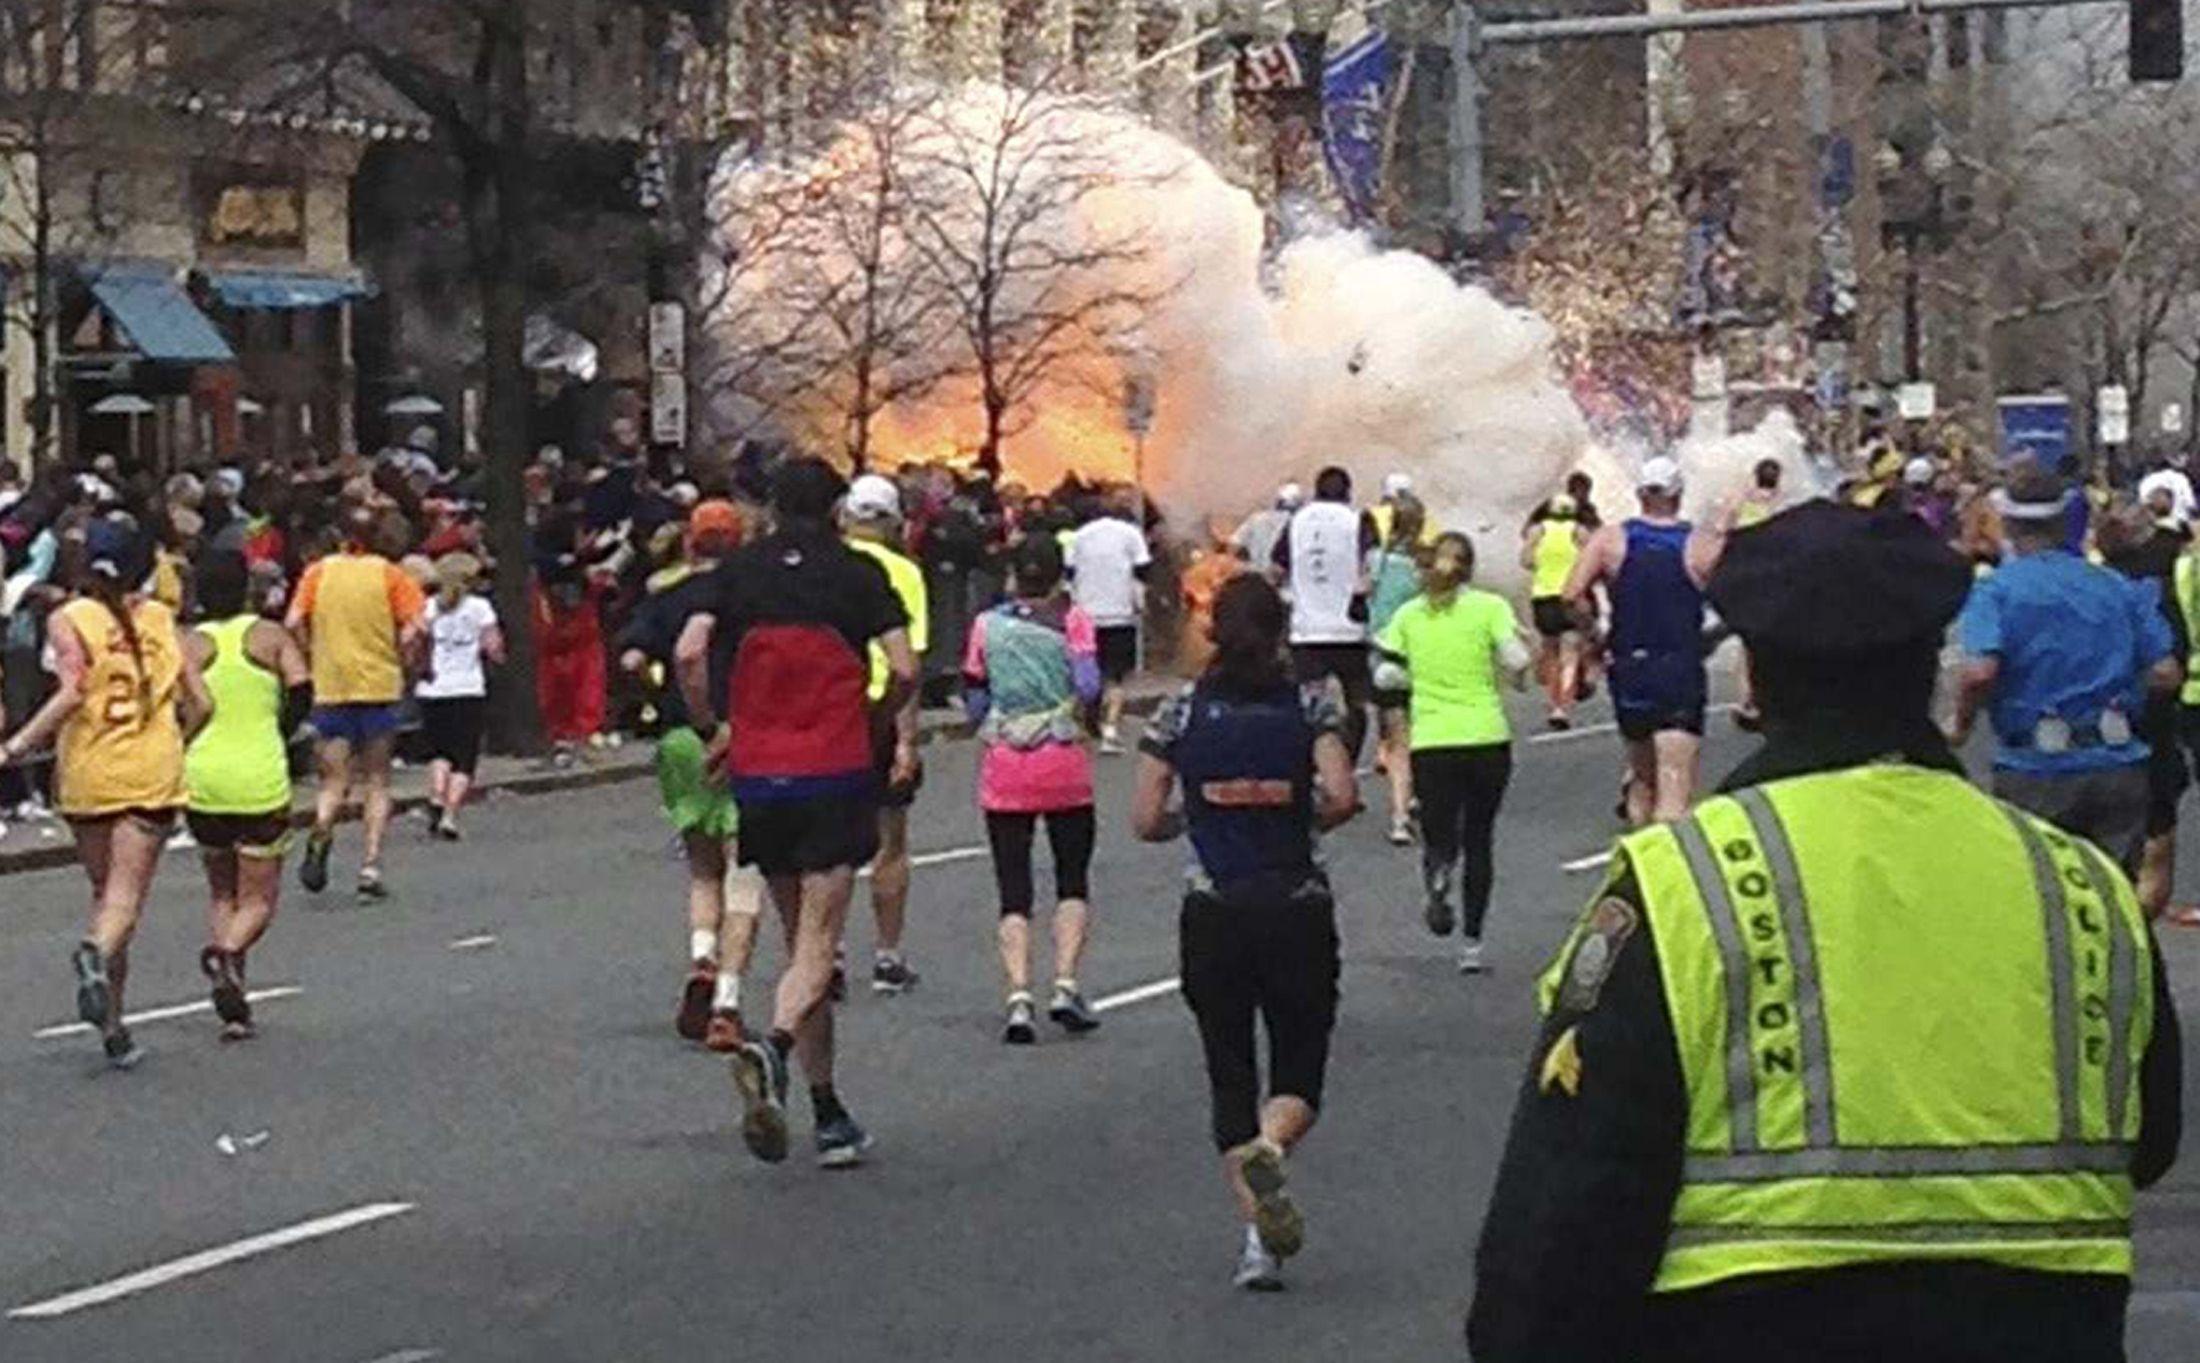 4-14-15 Boston bombing